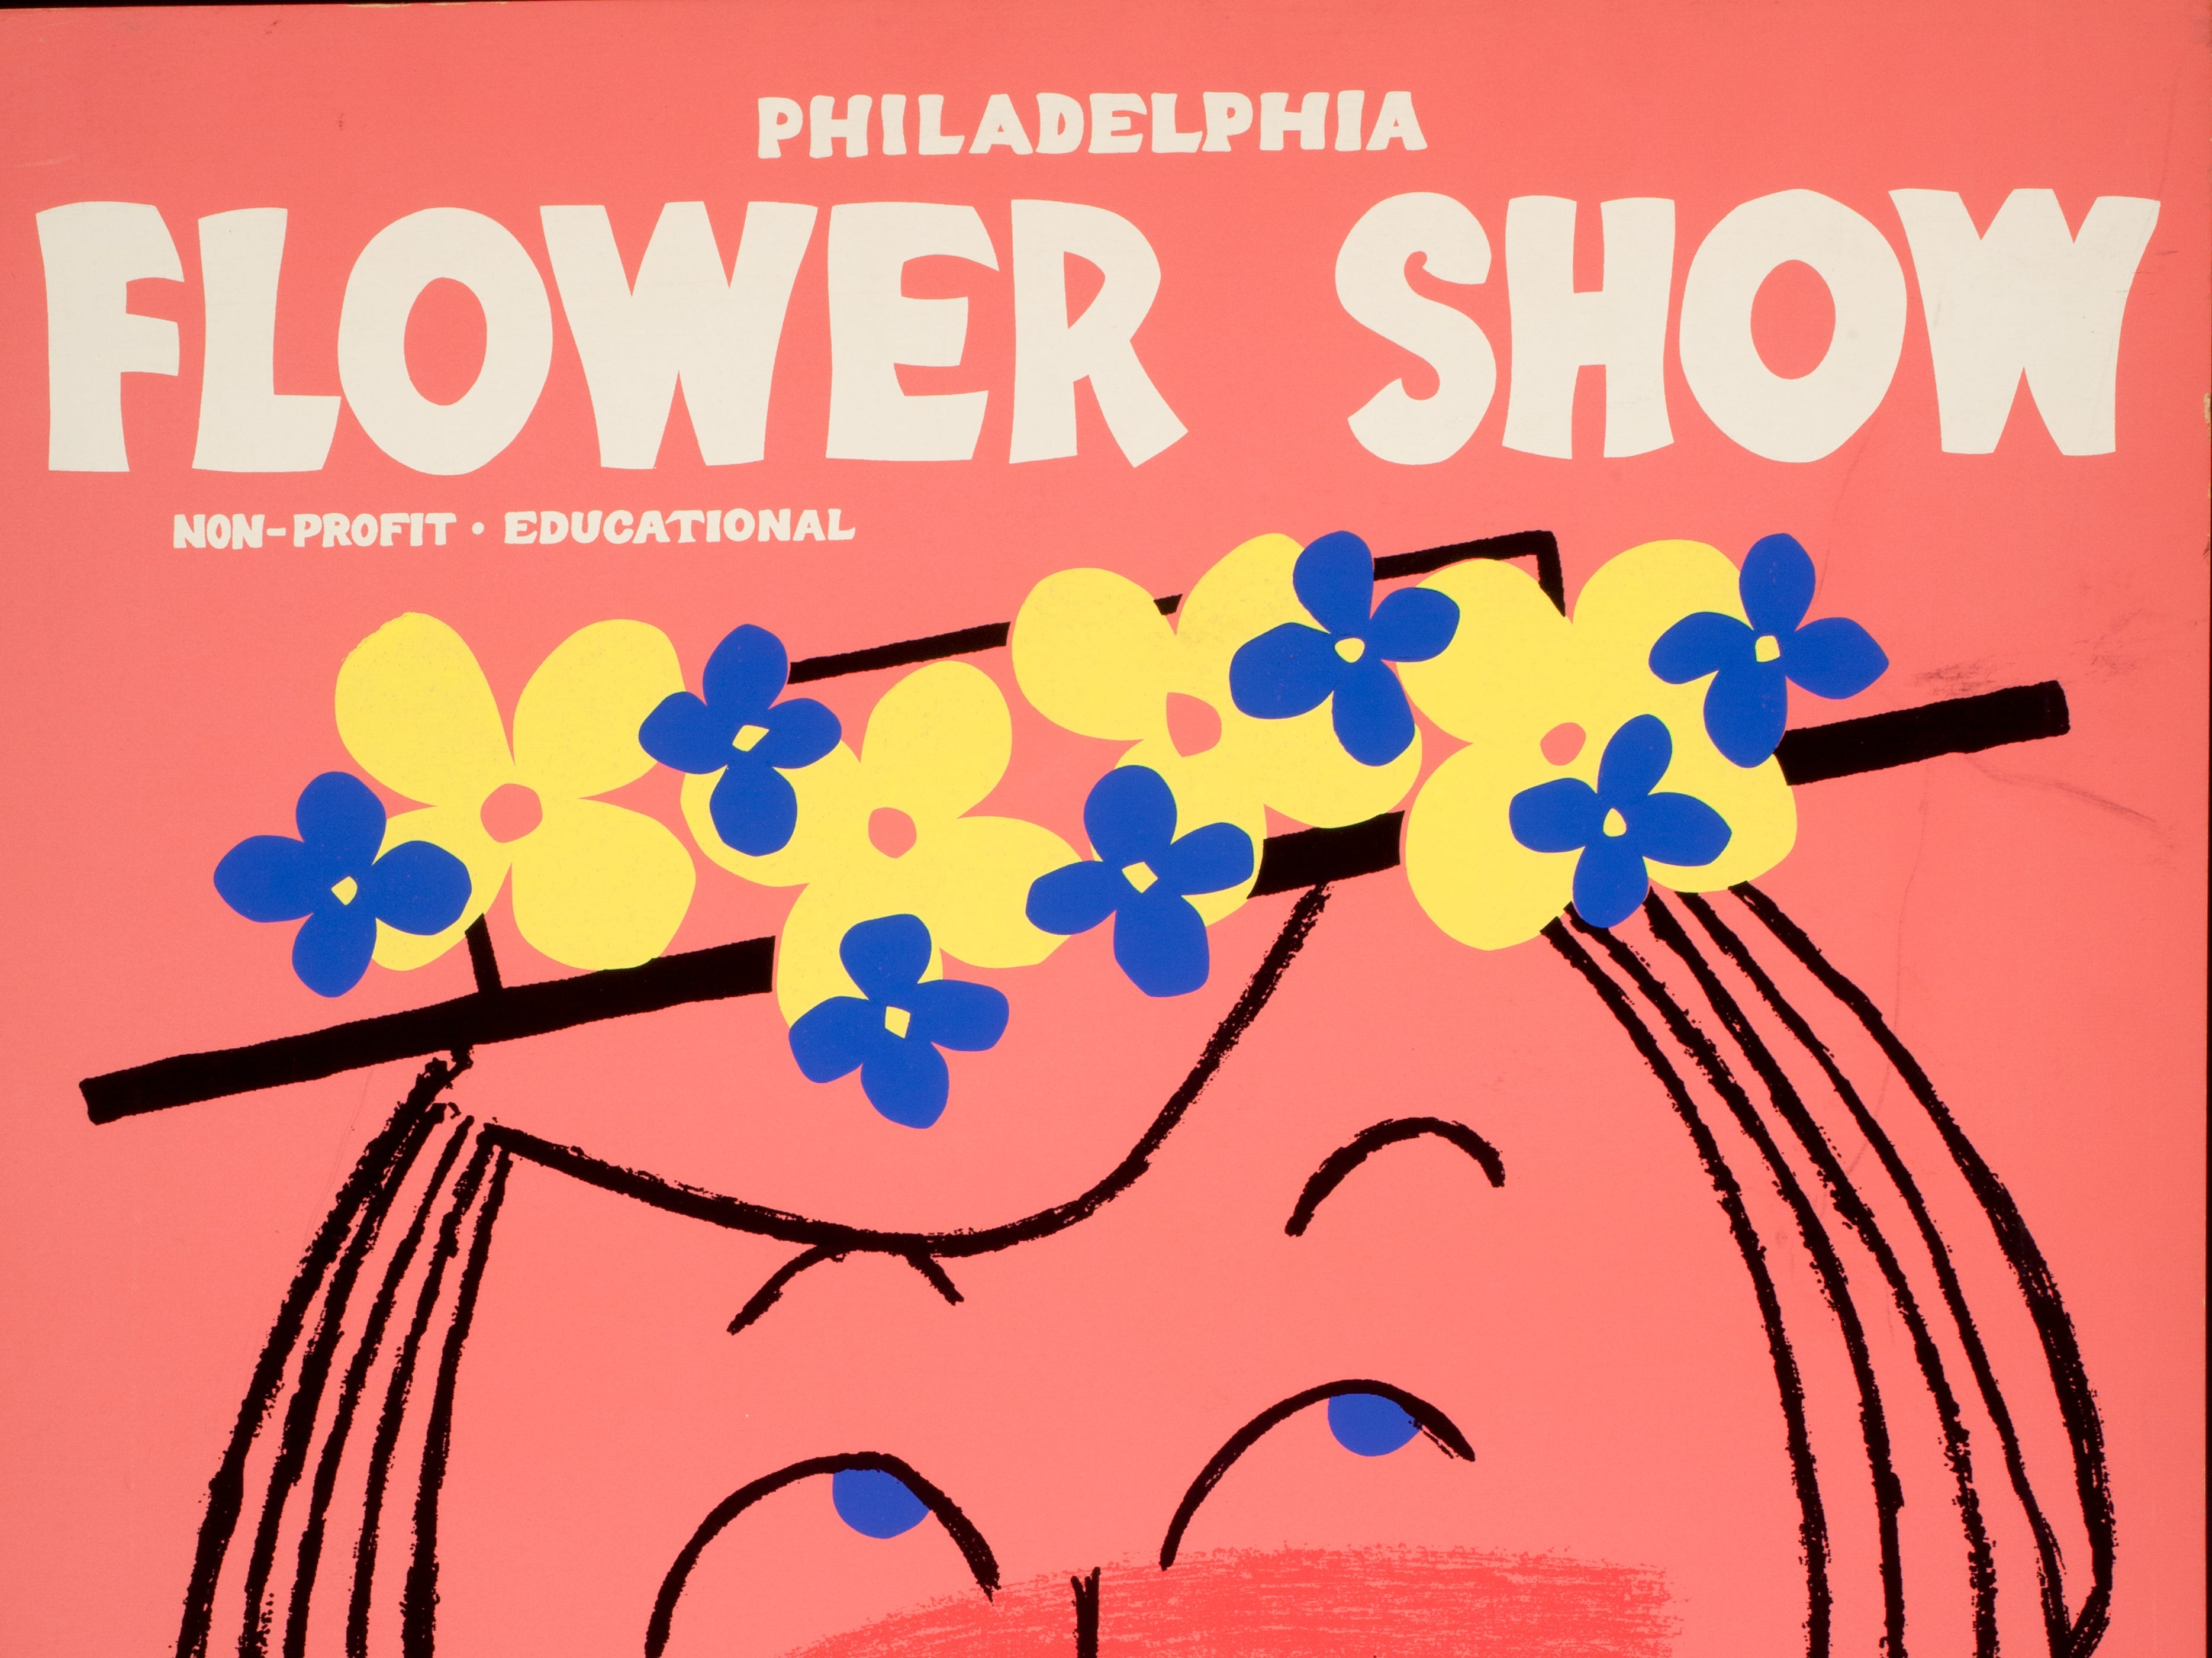 A poster for the 1956 Philadelphia Flower Show.